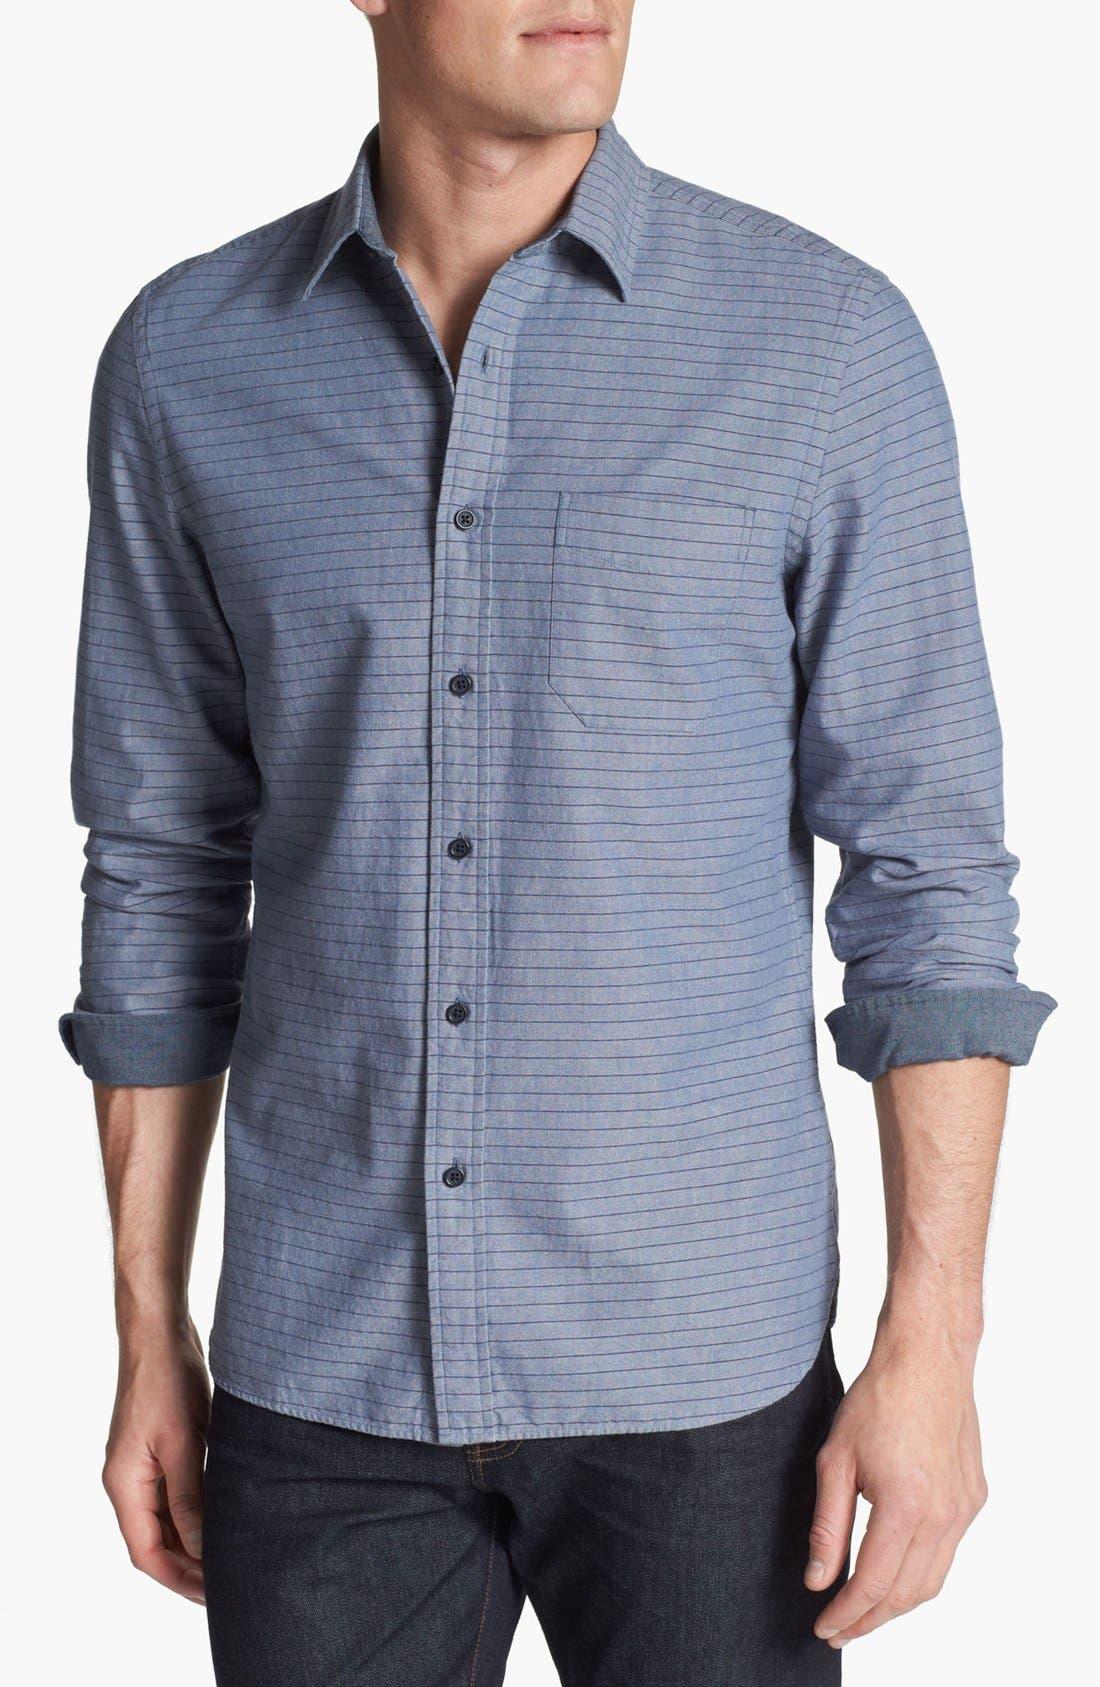 Main Image - Wallin & Bros. Trim Fit Sport Shirt